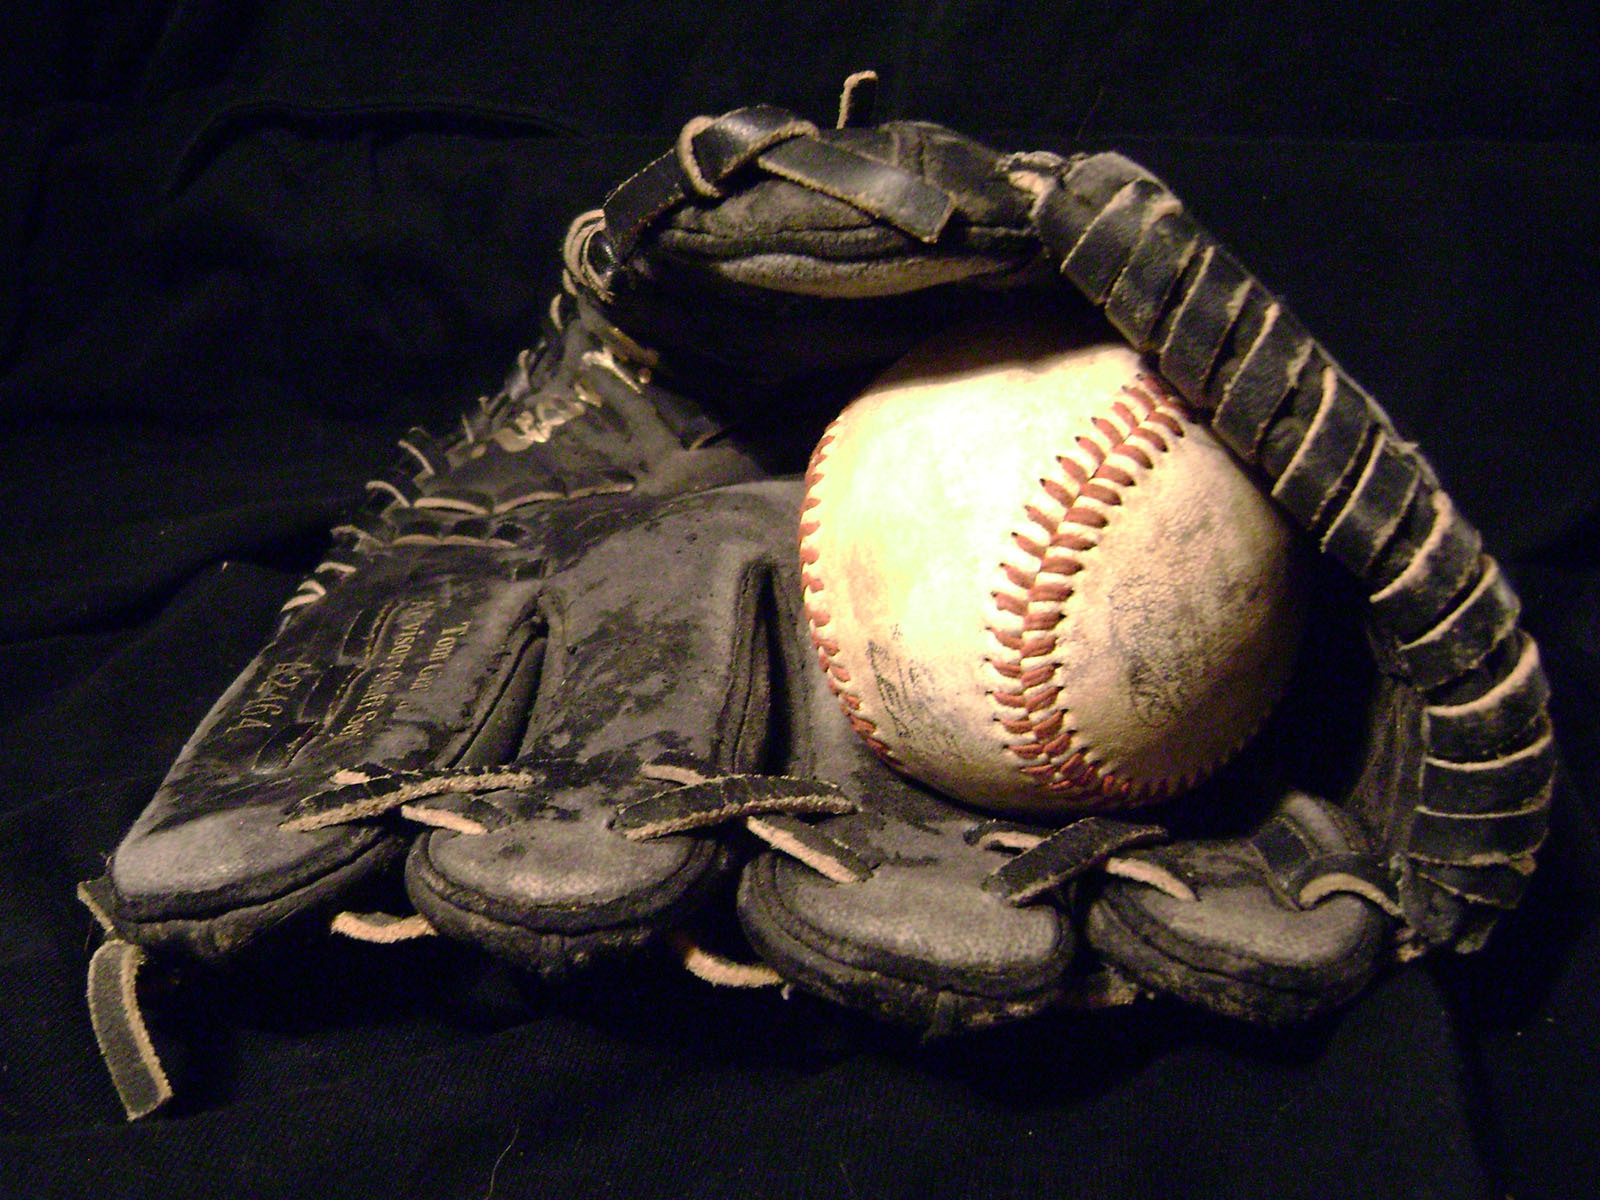 fa52aaefe023acfe9f0d_c84c3441459b326f12d5_baseball_glove.jpg